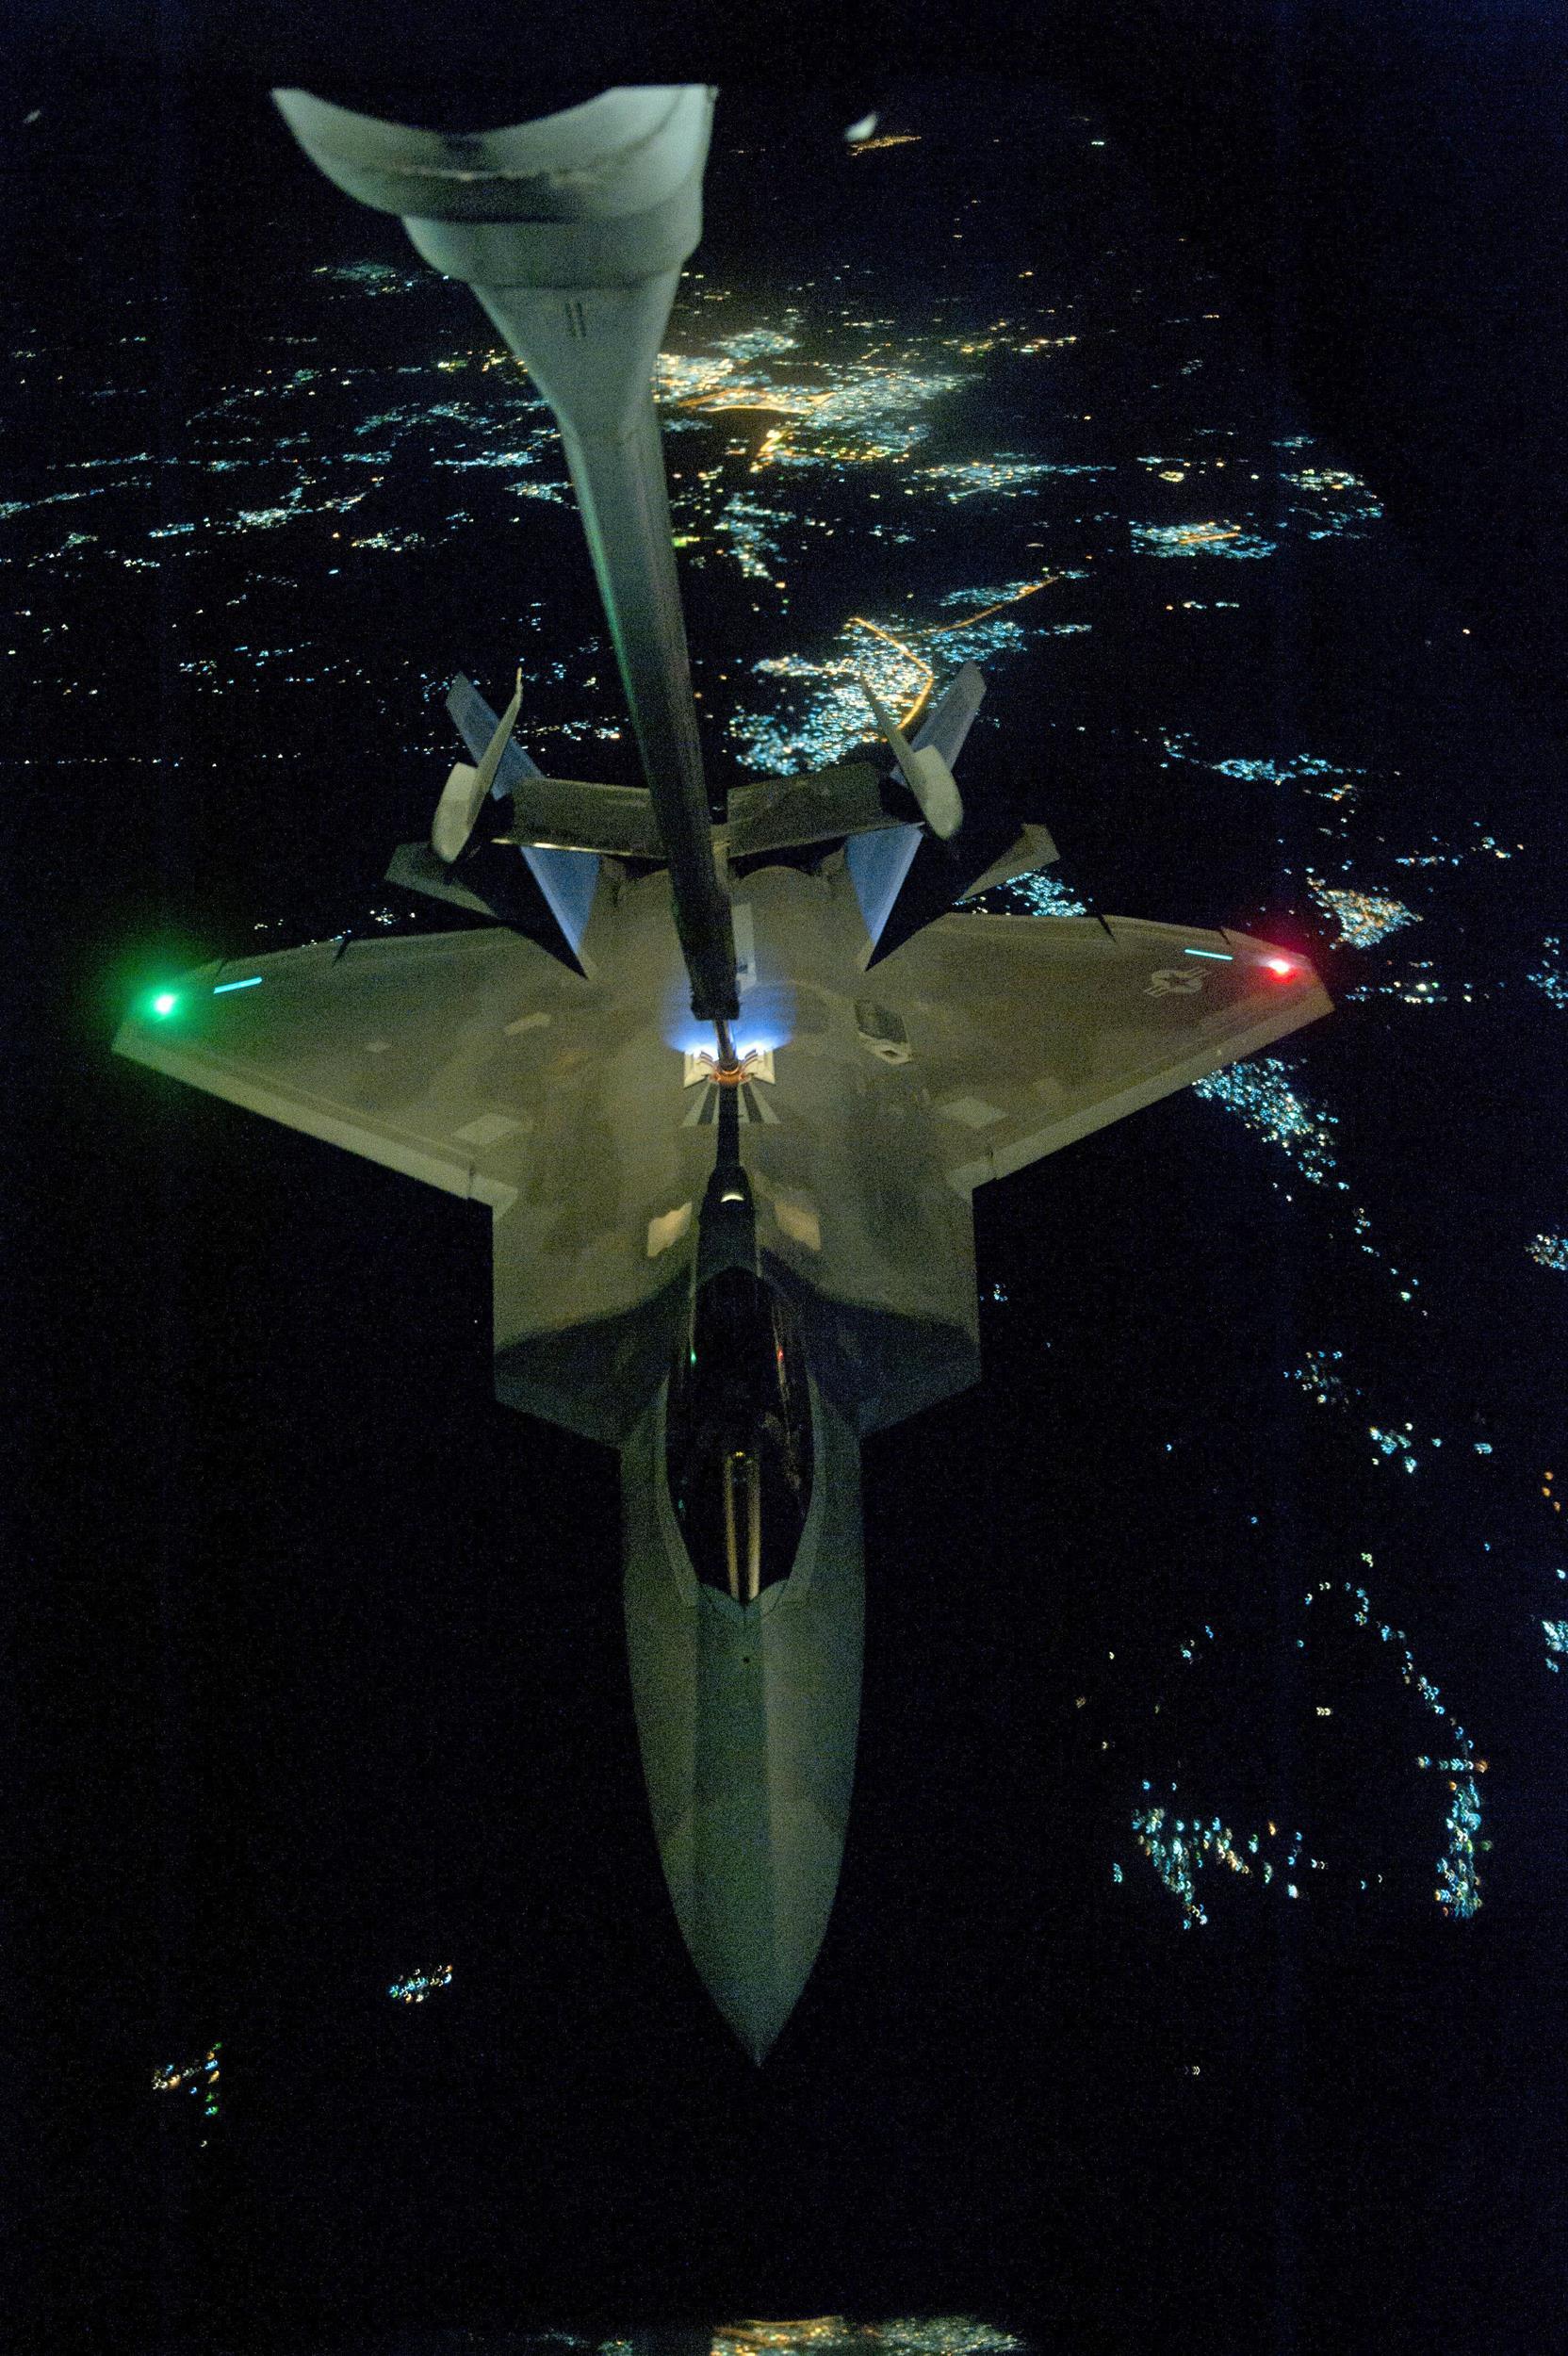 pc-140930-syria-air-force-10a_2622897aa3